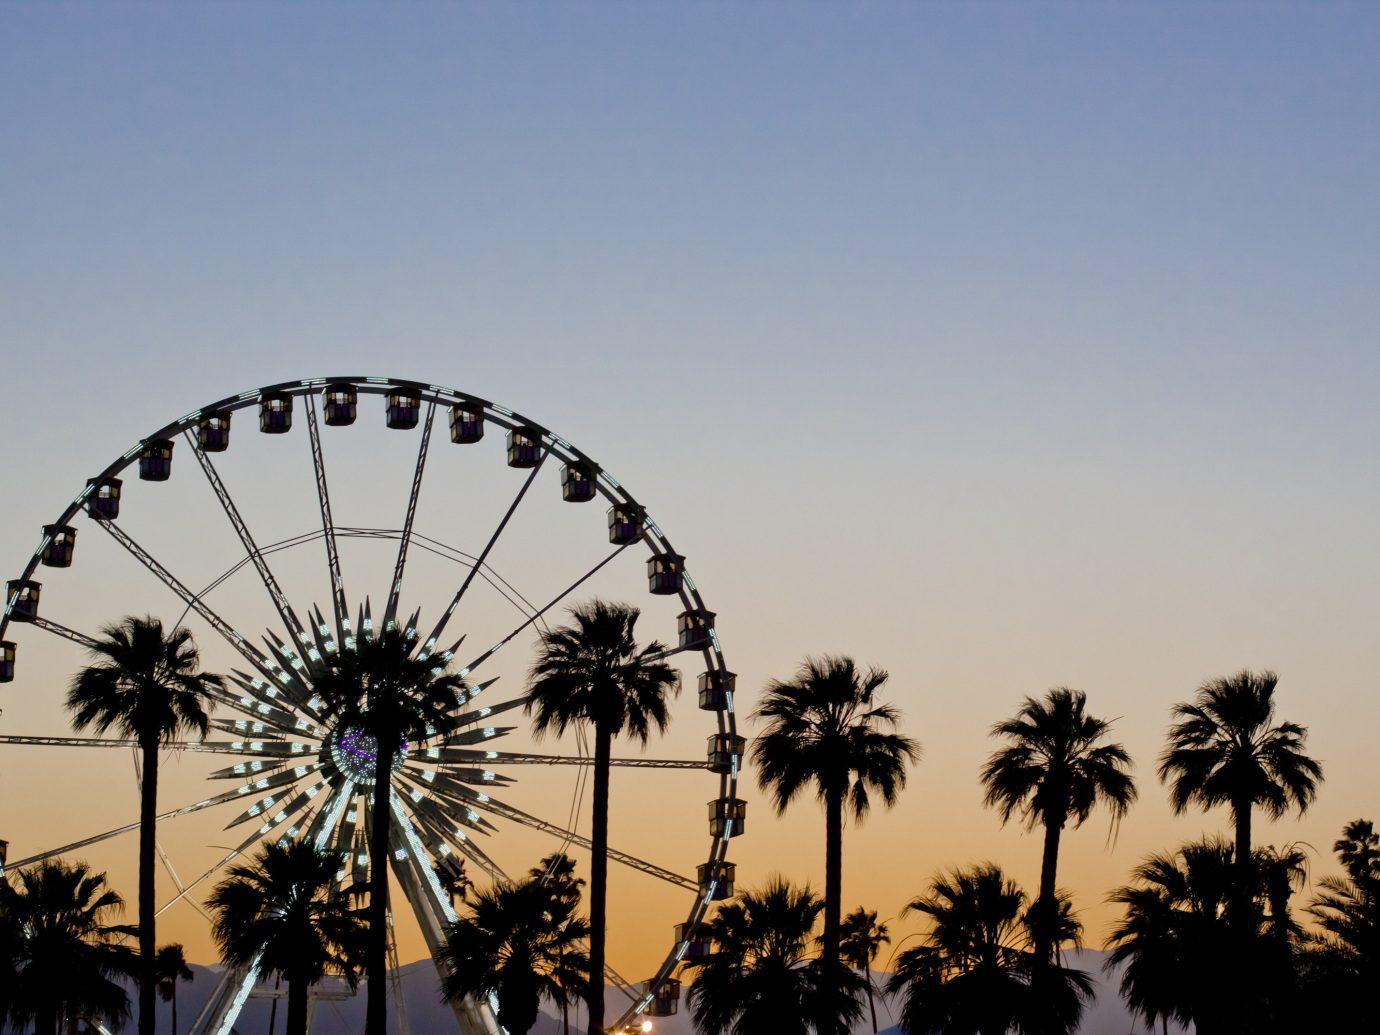 Hotels Offbeat Style + Design Trip Ideas sky palm tree outdoor object plant ferris wheel arecales flower recreation dusk park ride